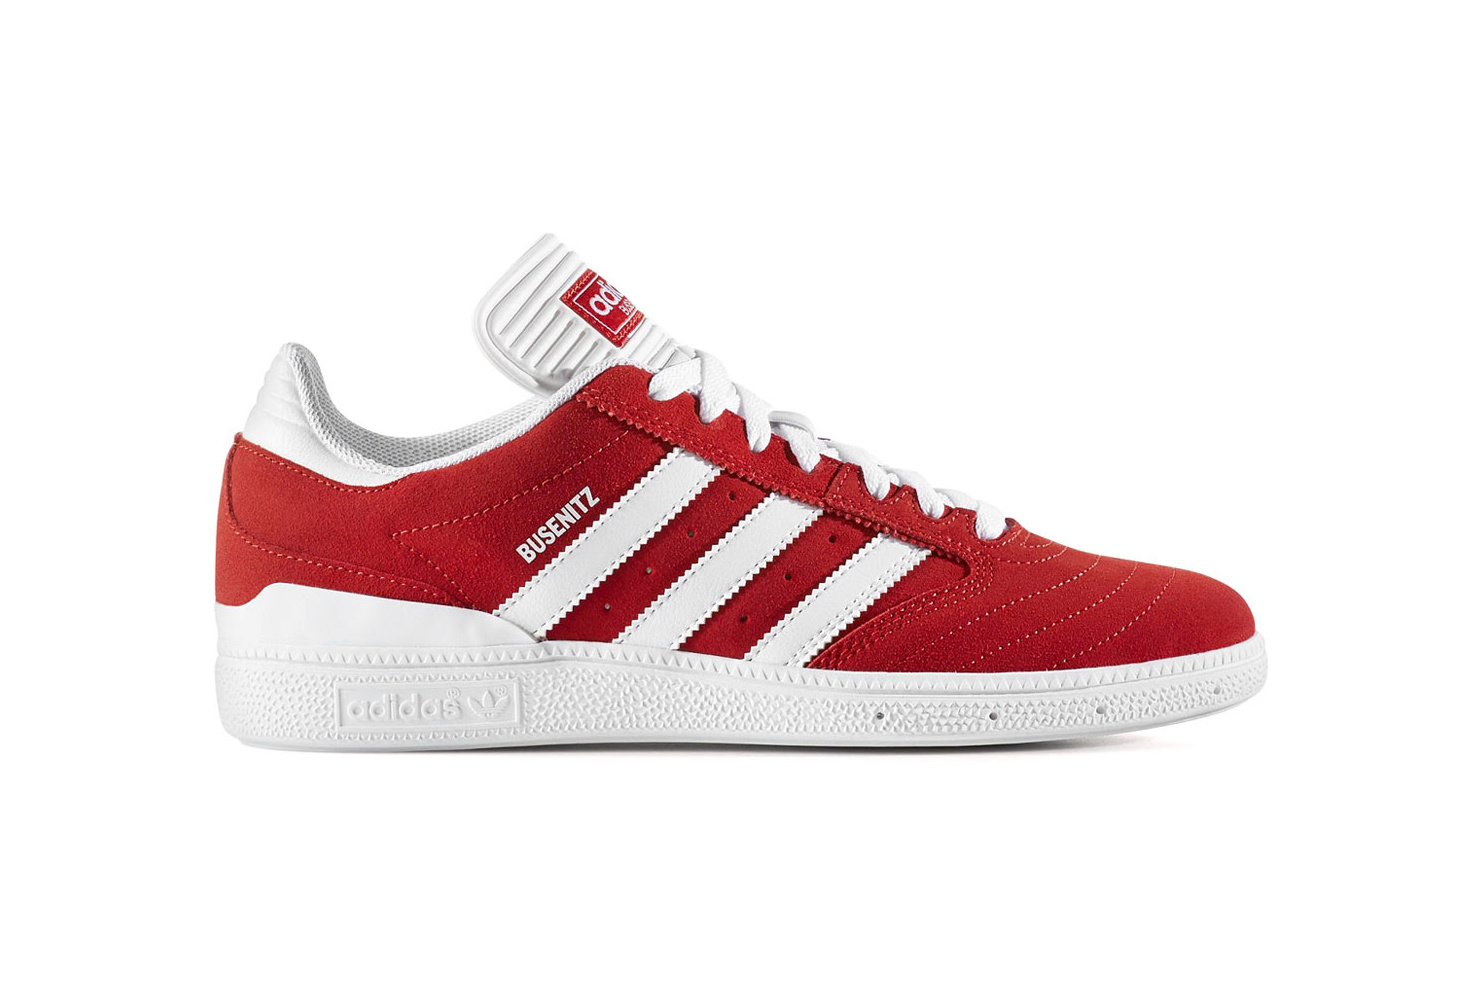 adidas-busenitz-gazelle-pack-1.jpg